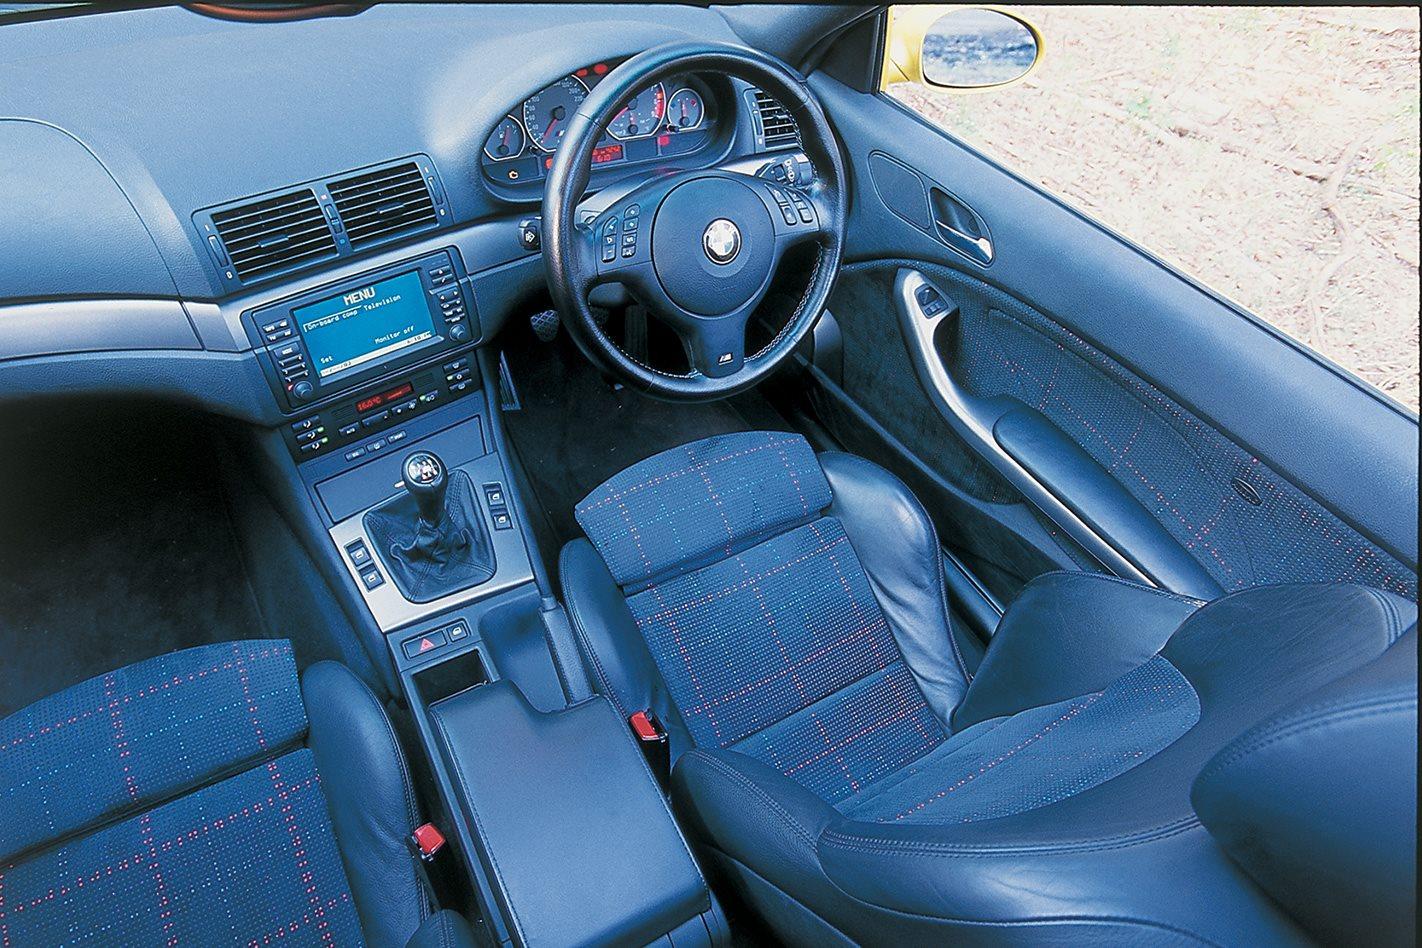 2003 BMW M3 interior